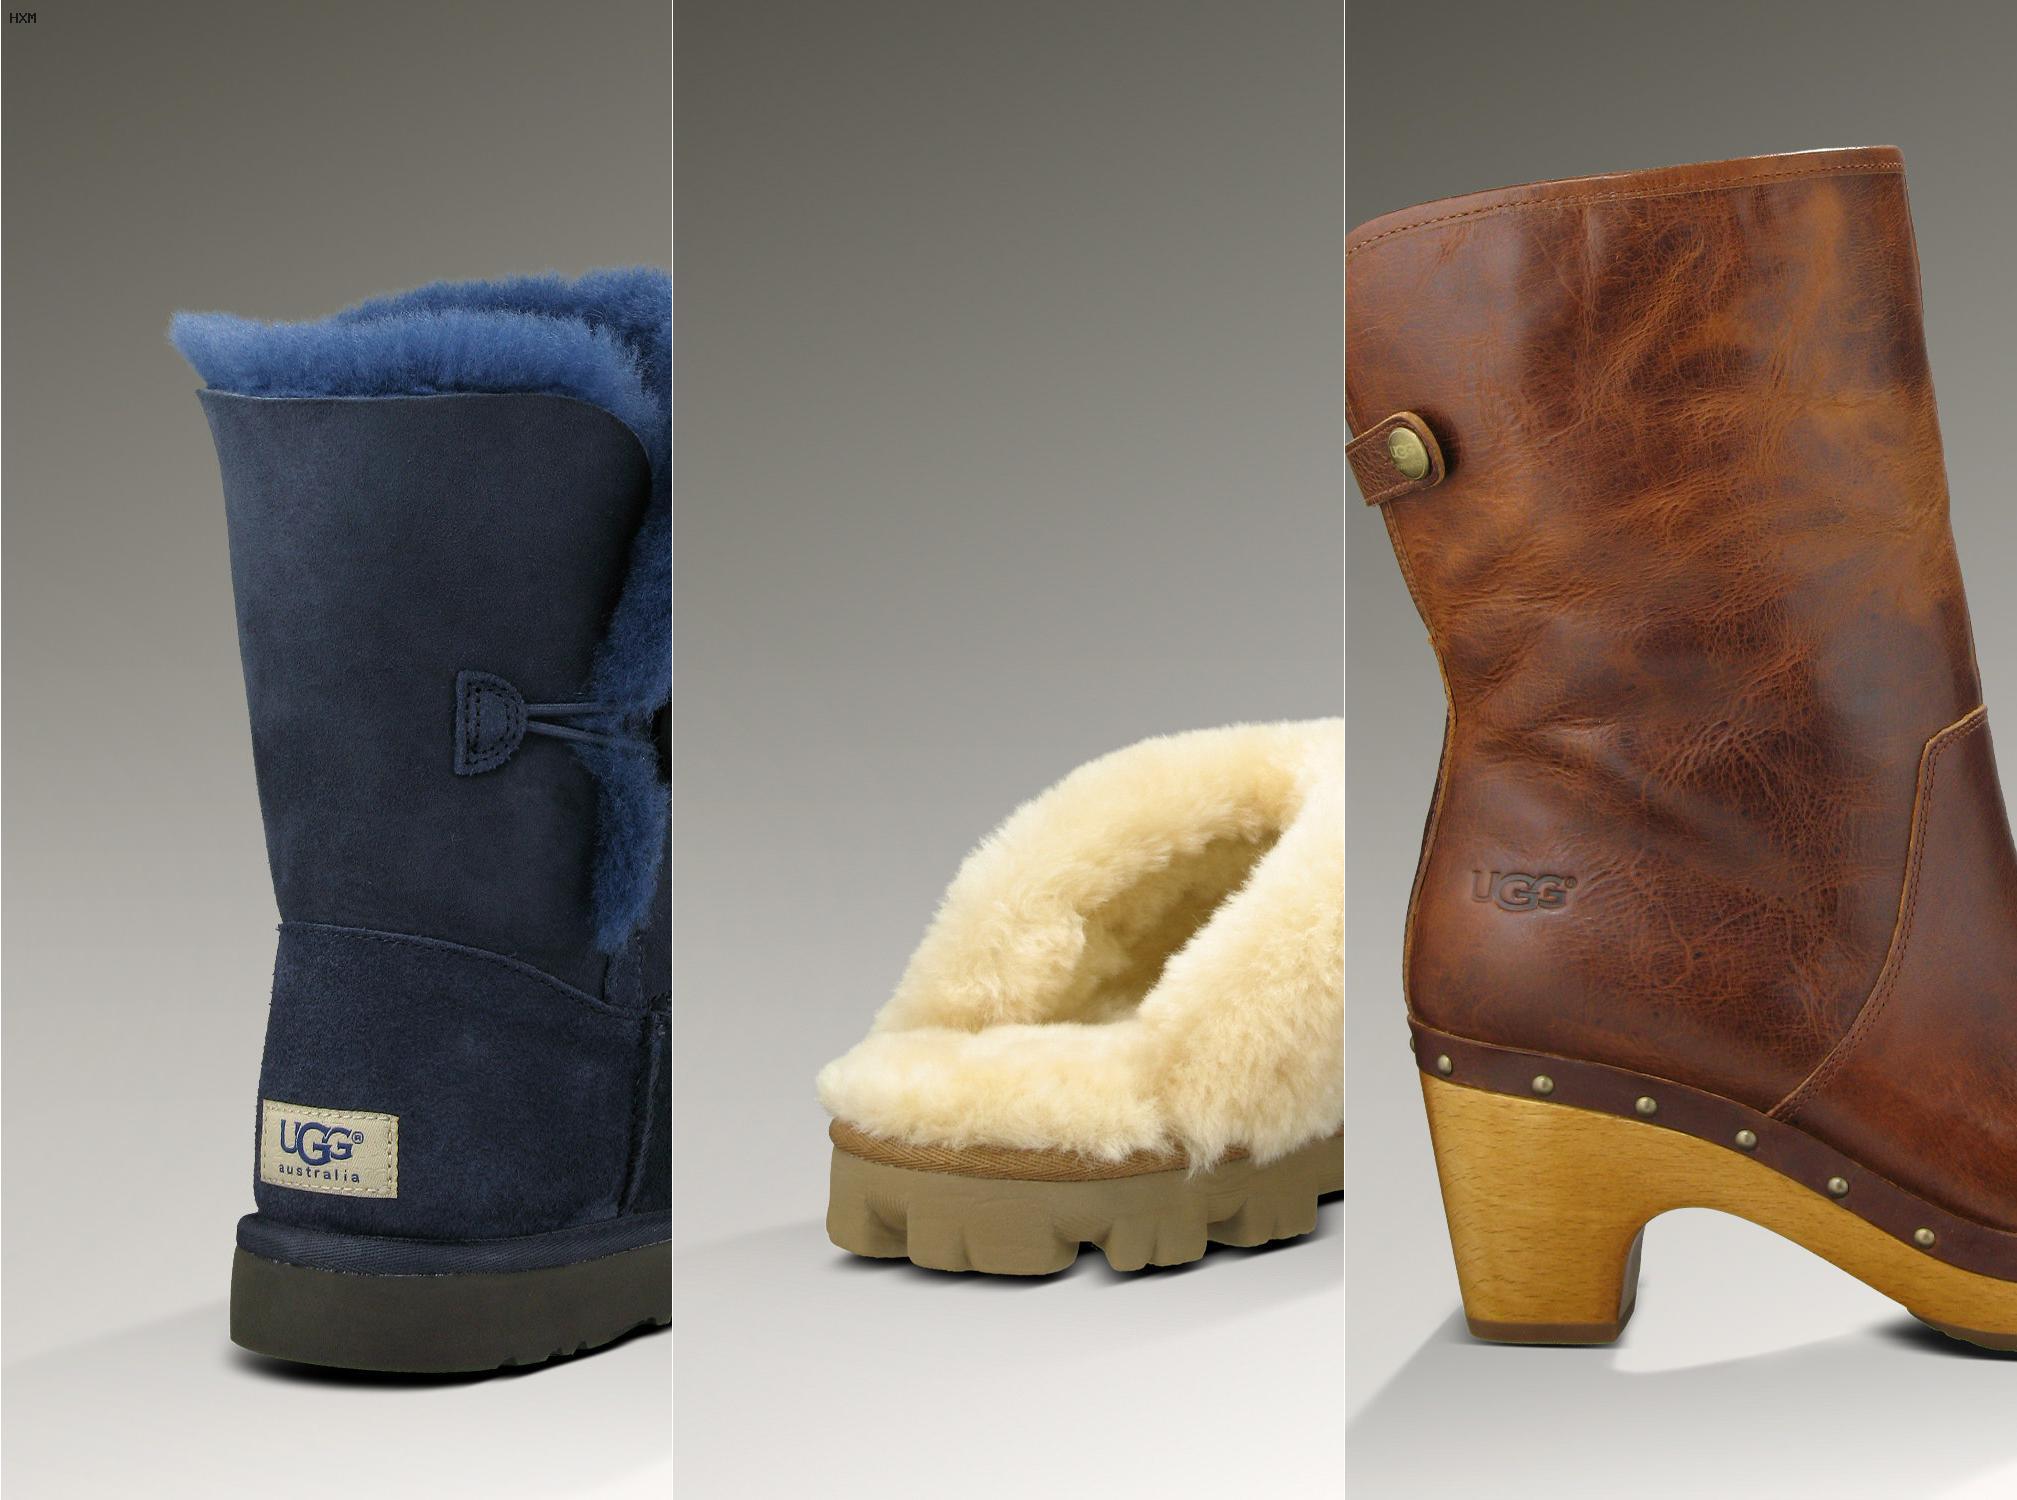 moonlight ugg boots